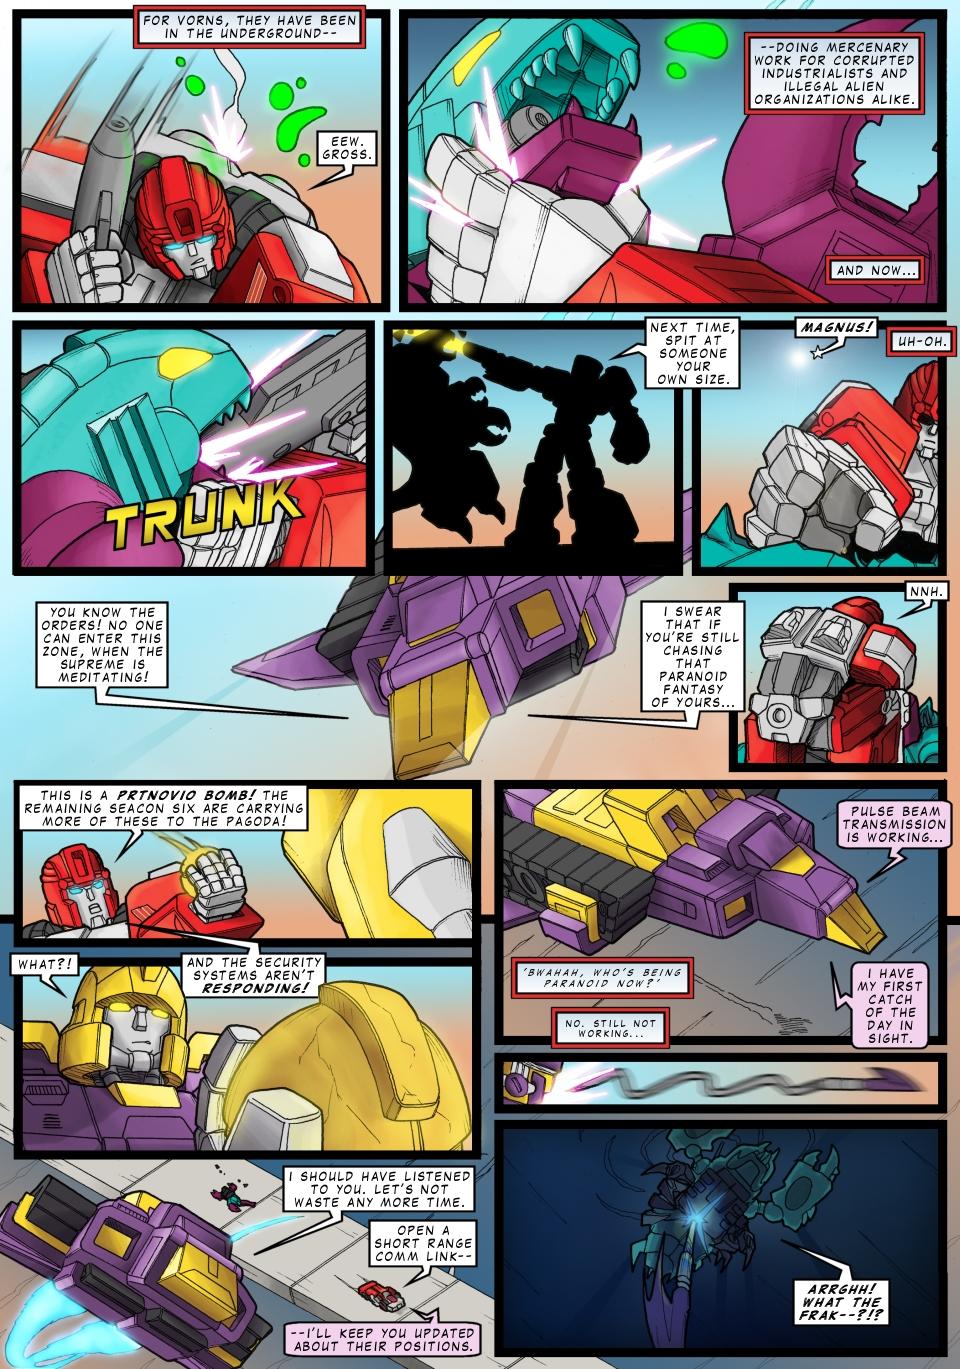 05 Magnus page 14